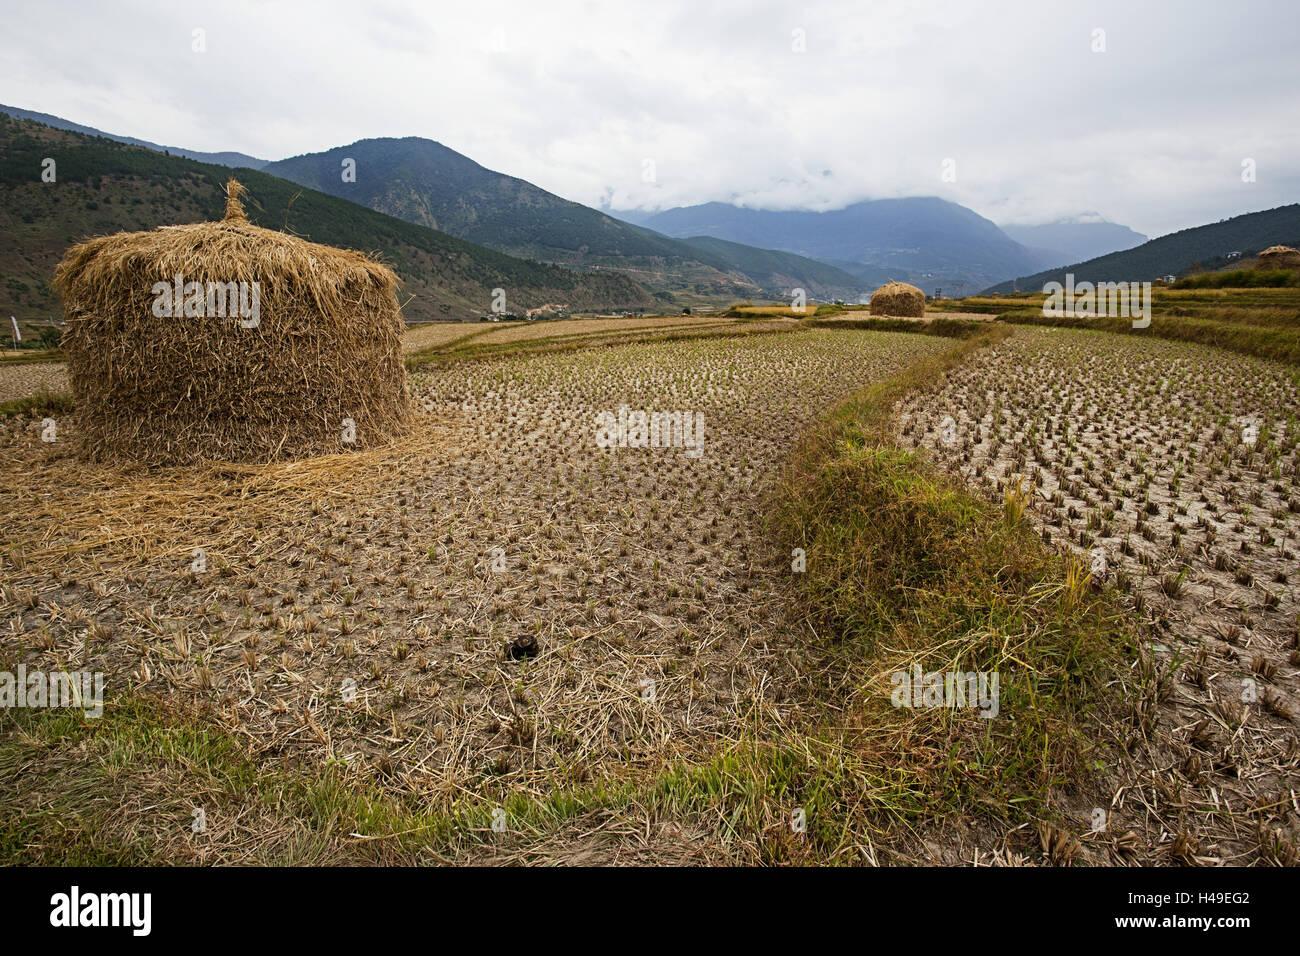 Kingdom Bhutan, rice field, - Stock Image